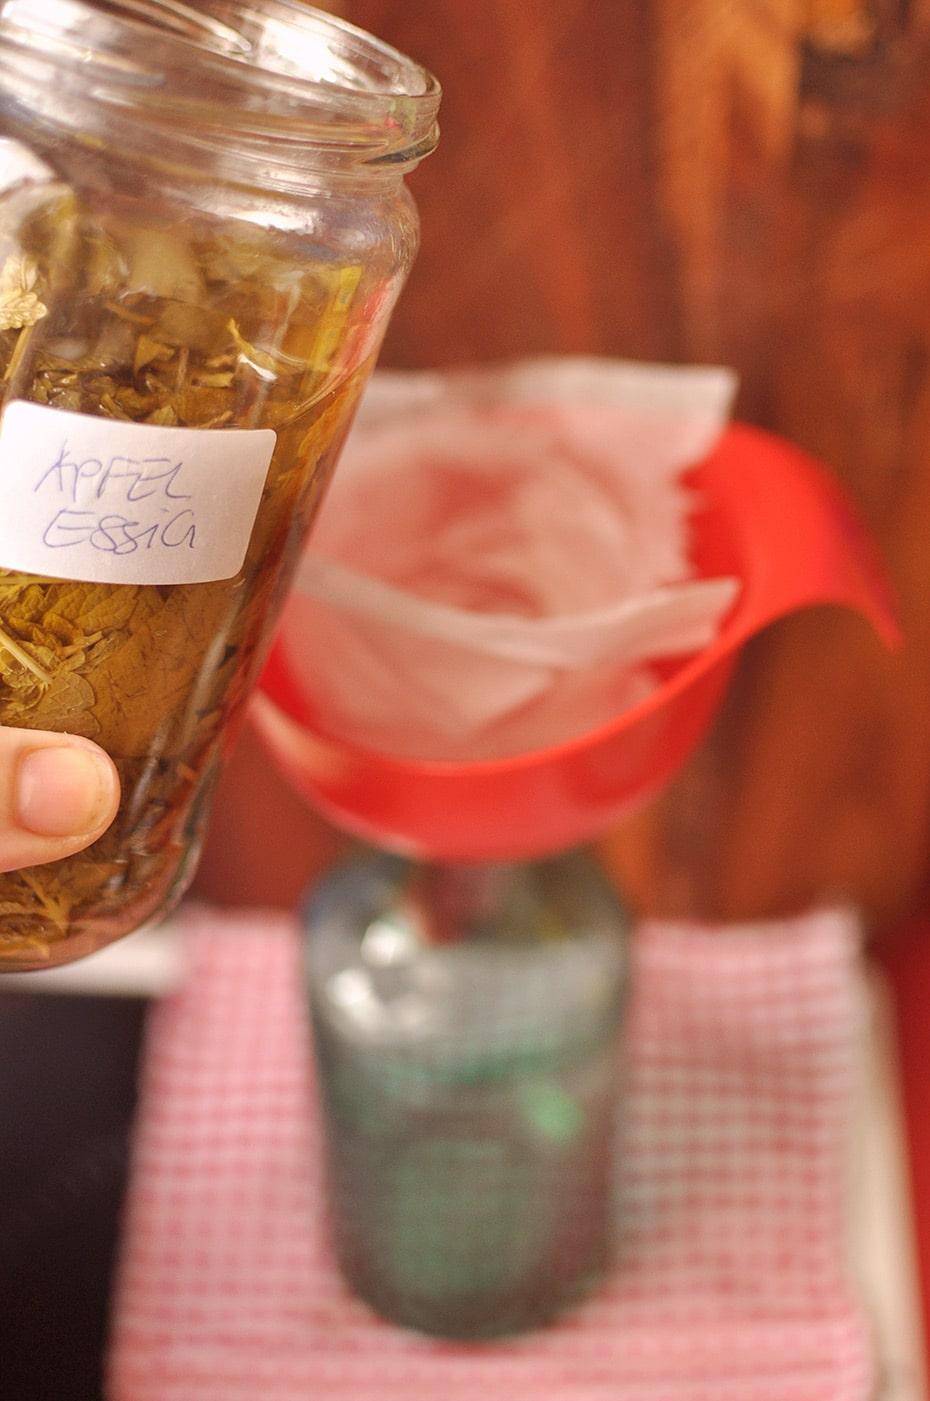 Saure Rinse mit Zitronenmelisse gegen sprödes Sommerhaar | Schwatz Katz